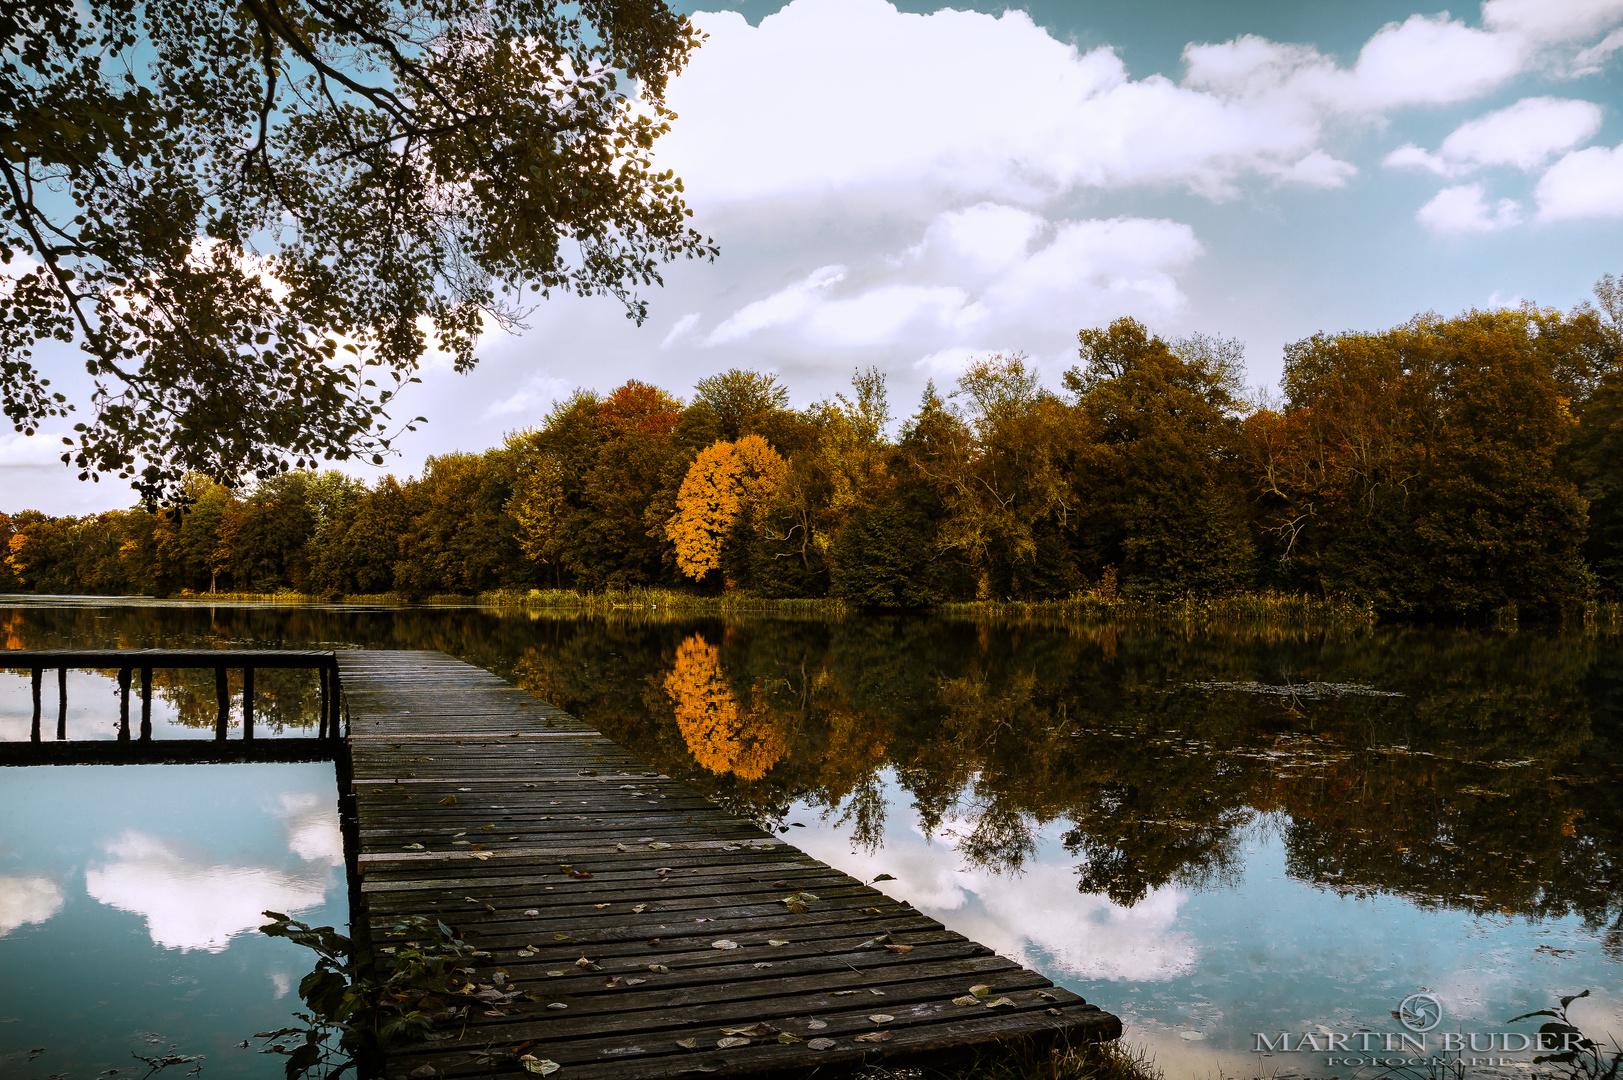 Teich im Schloßpark Altdöbern